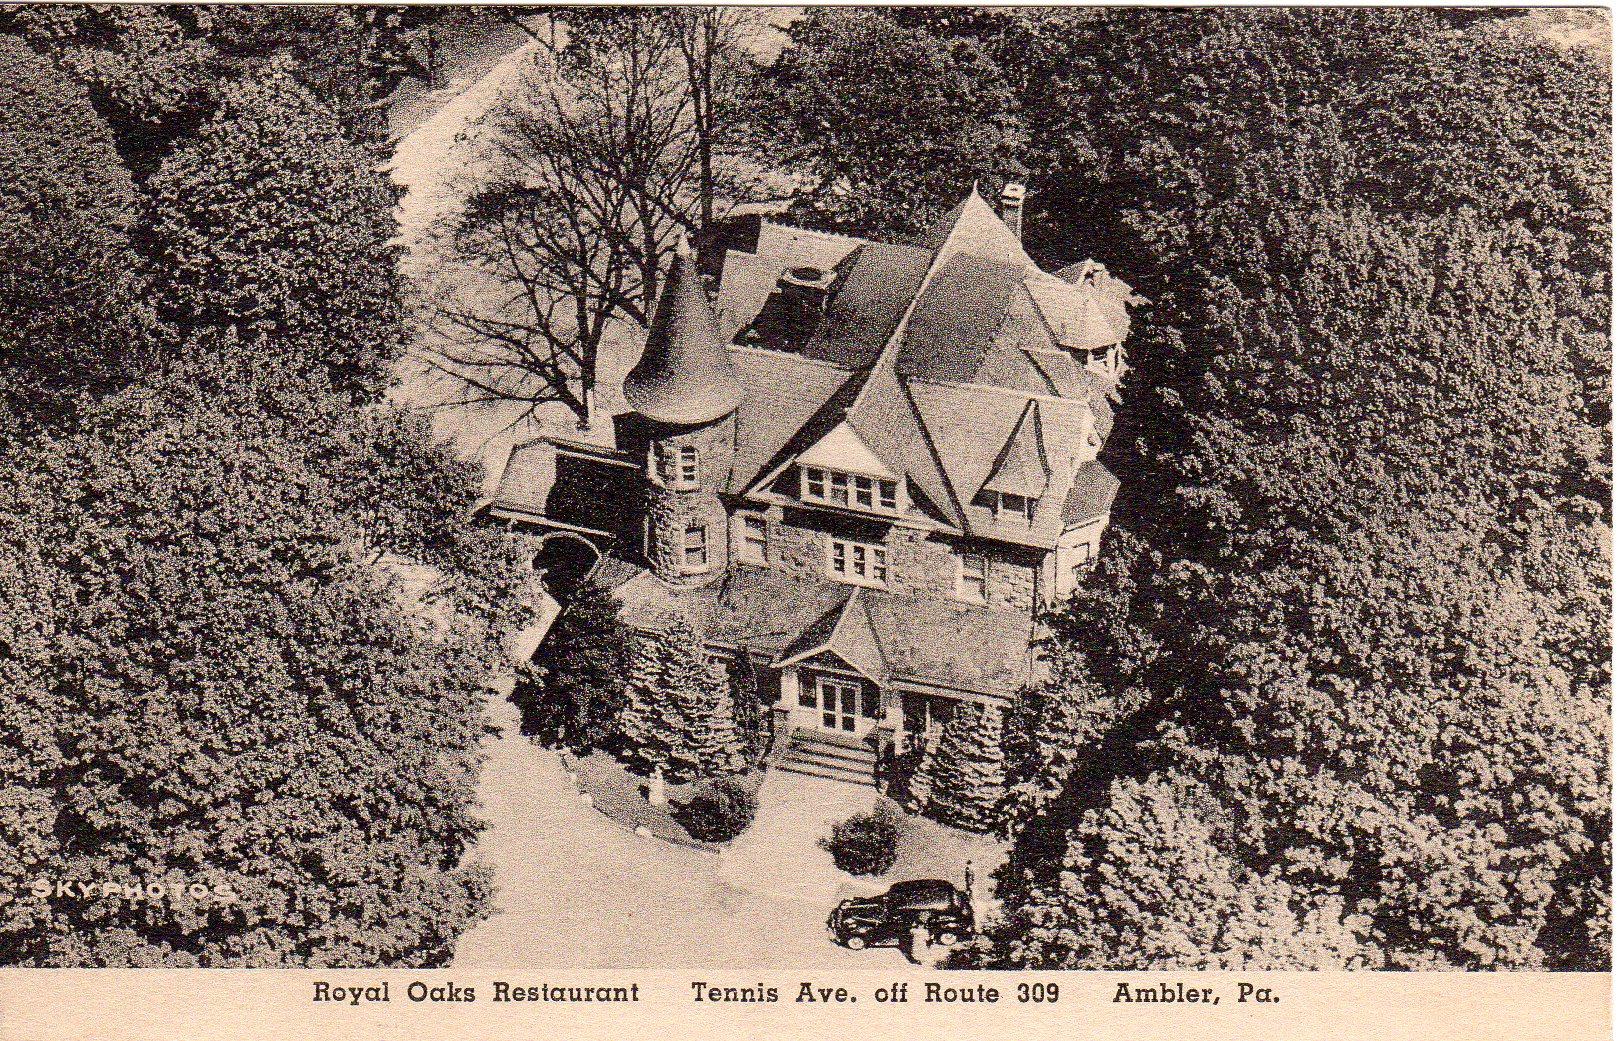 Post Card Collection (E Simon)_2682_18_ Royal Oaks Restaurant, Tennis Ave (off Rt 309) Ambler, Pa_1950